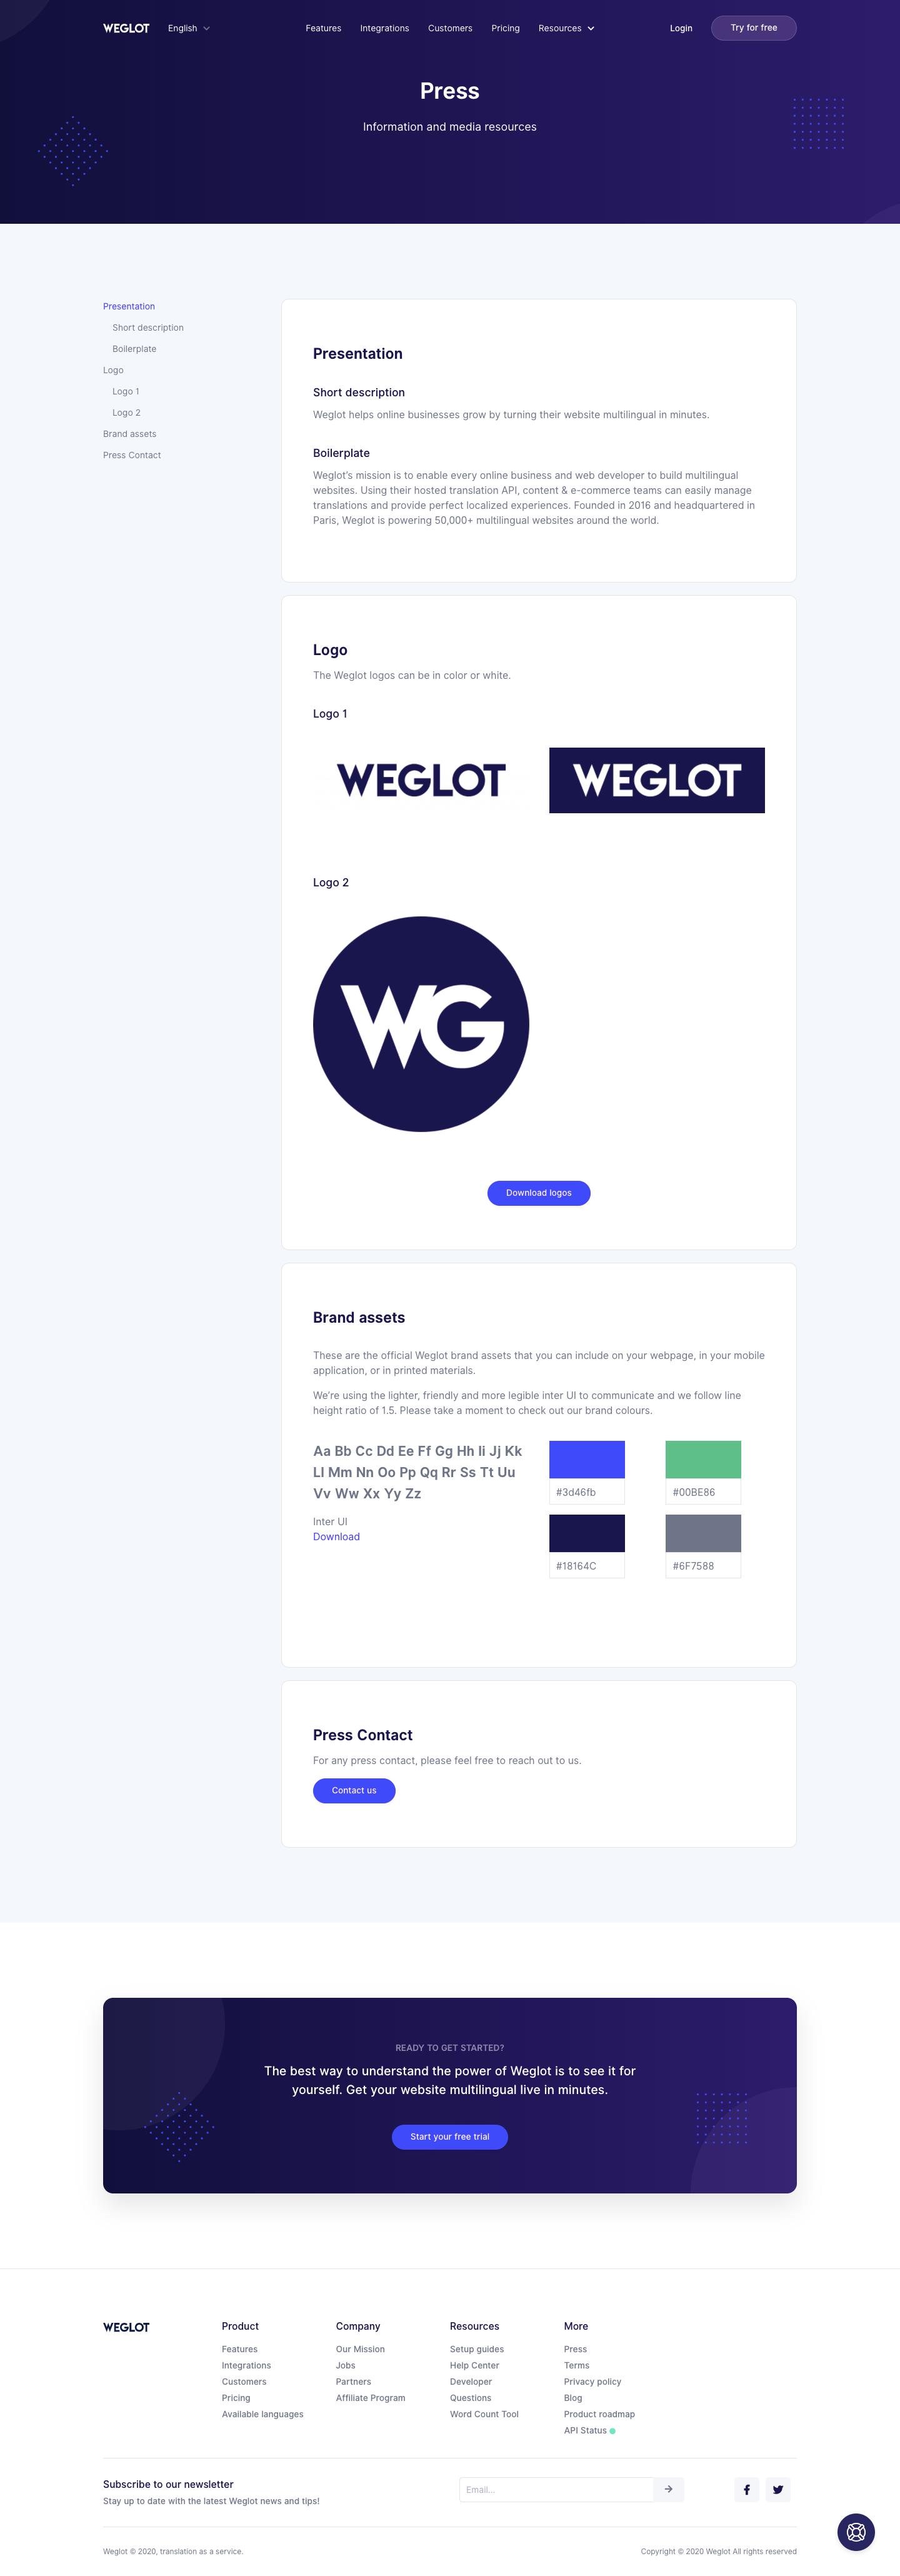 Weglot Press Page